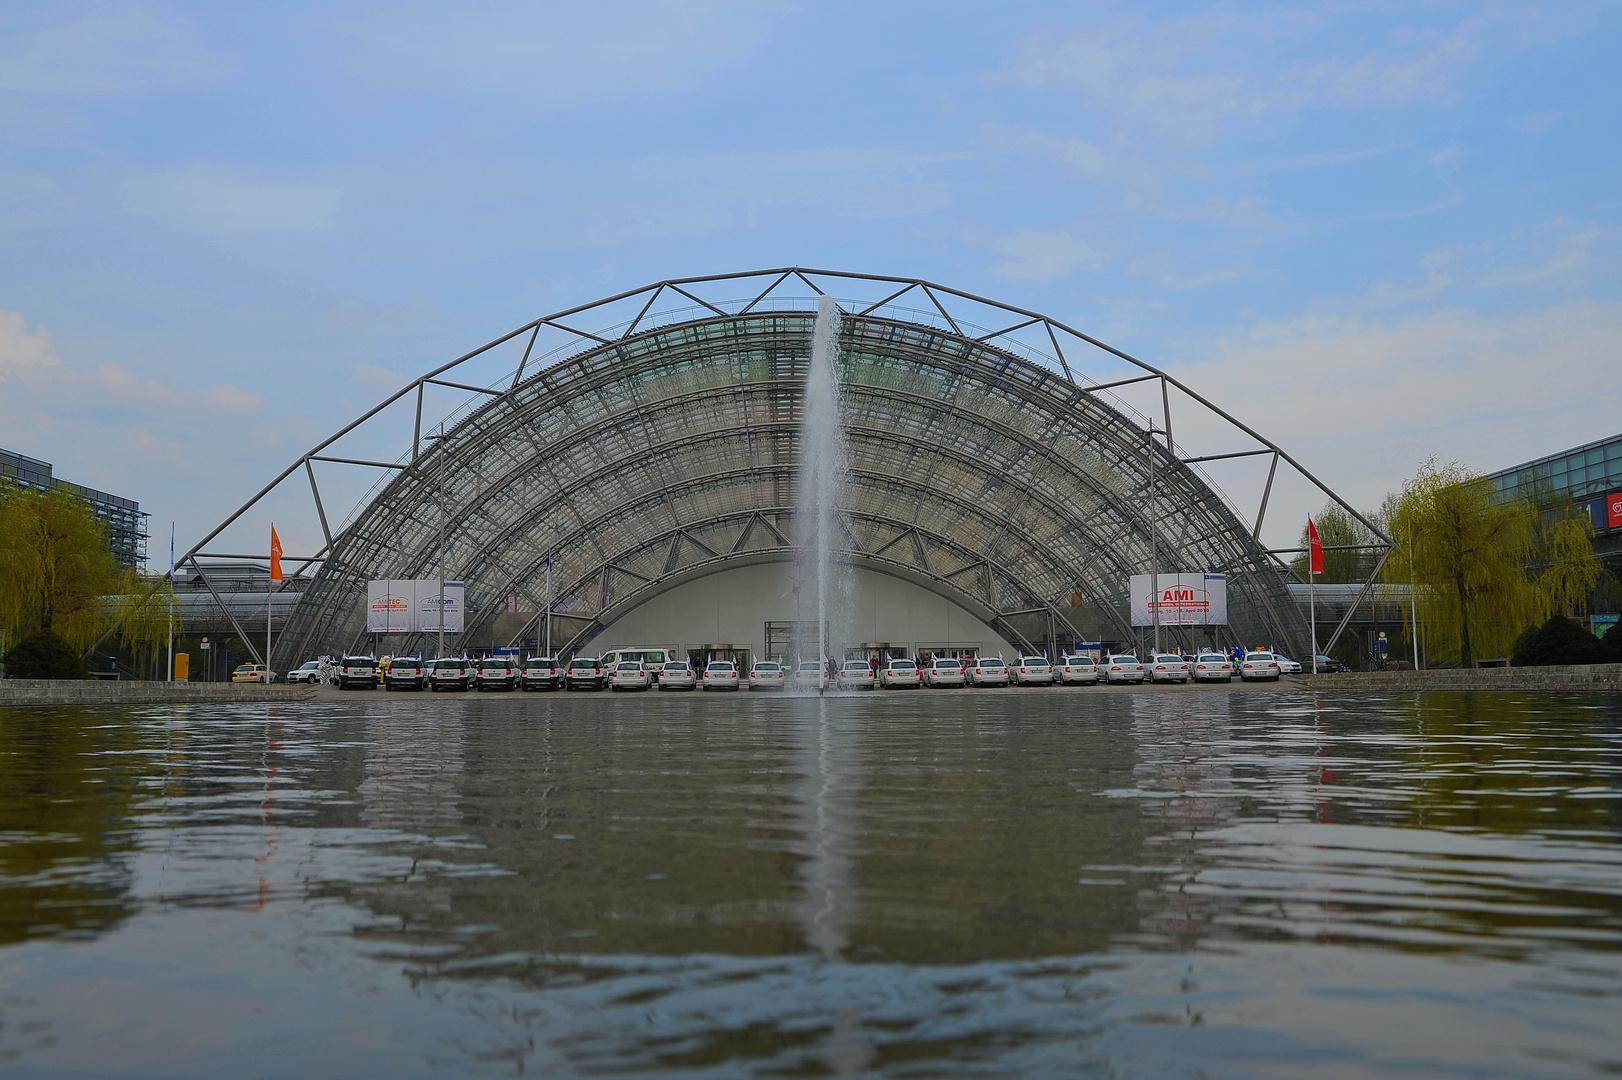 AMI 2010 - Glashalle